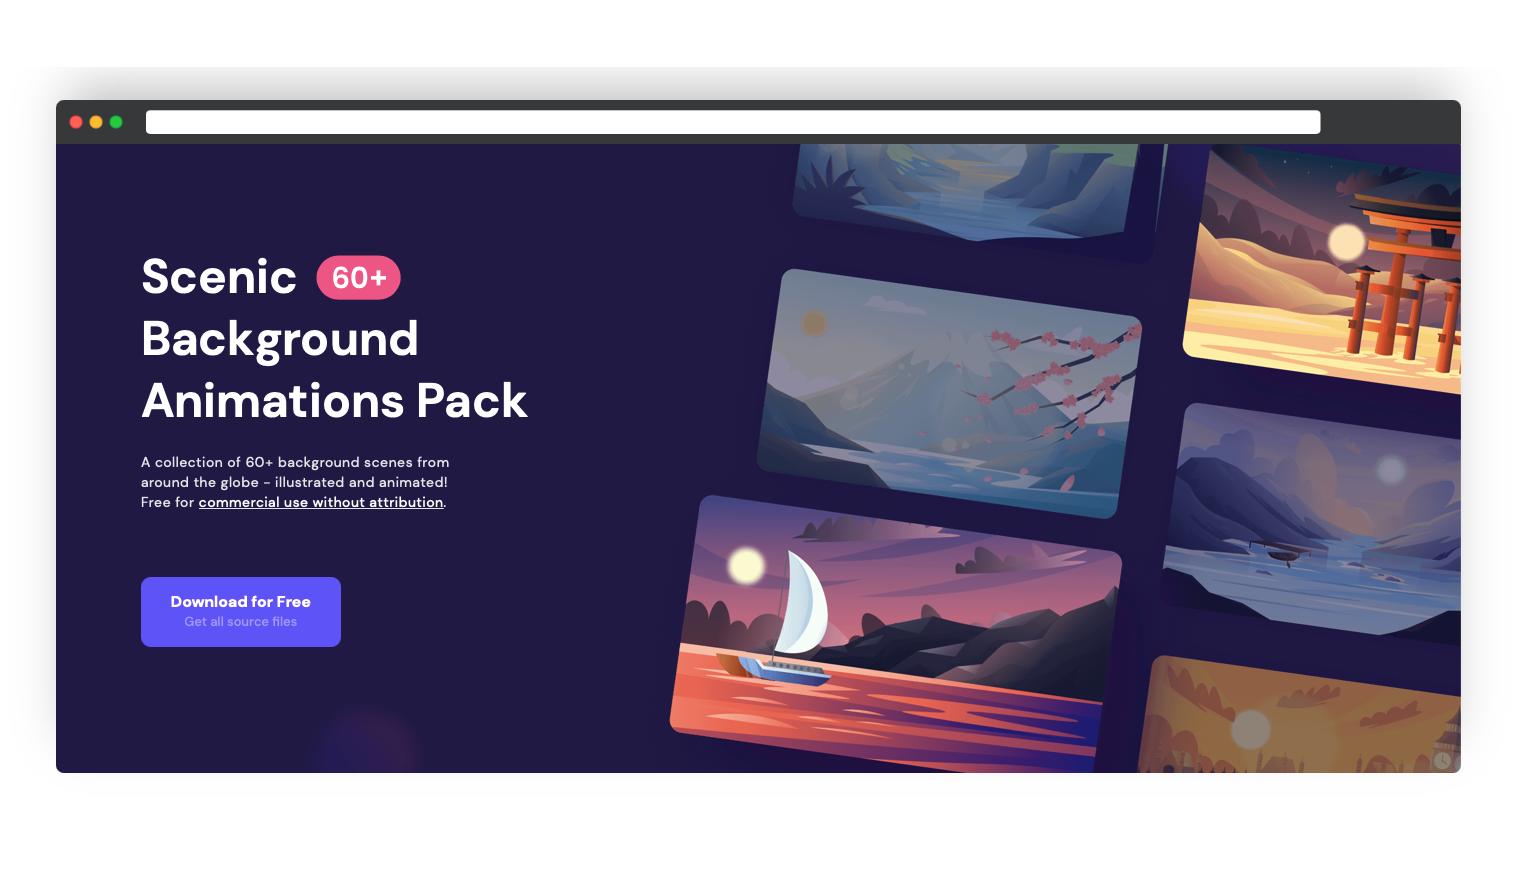 Background animation pack